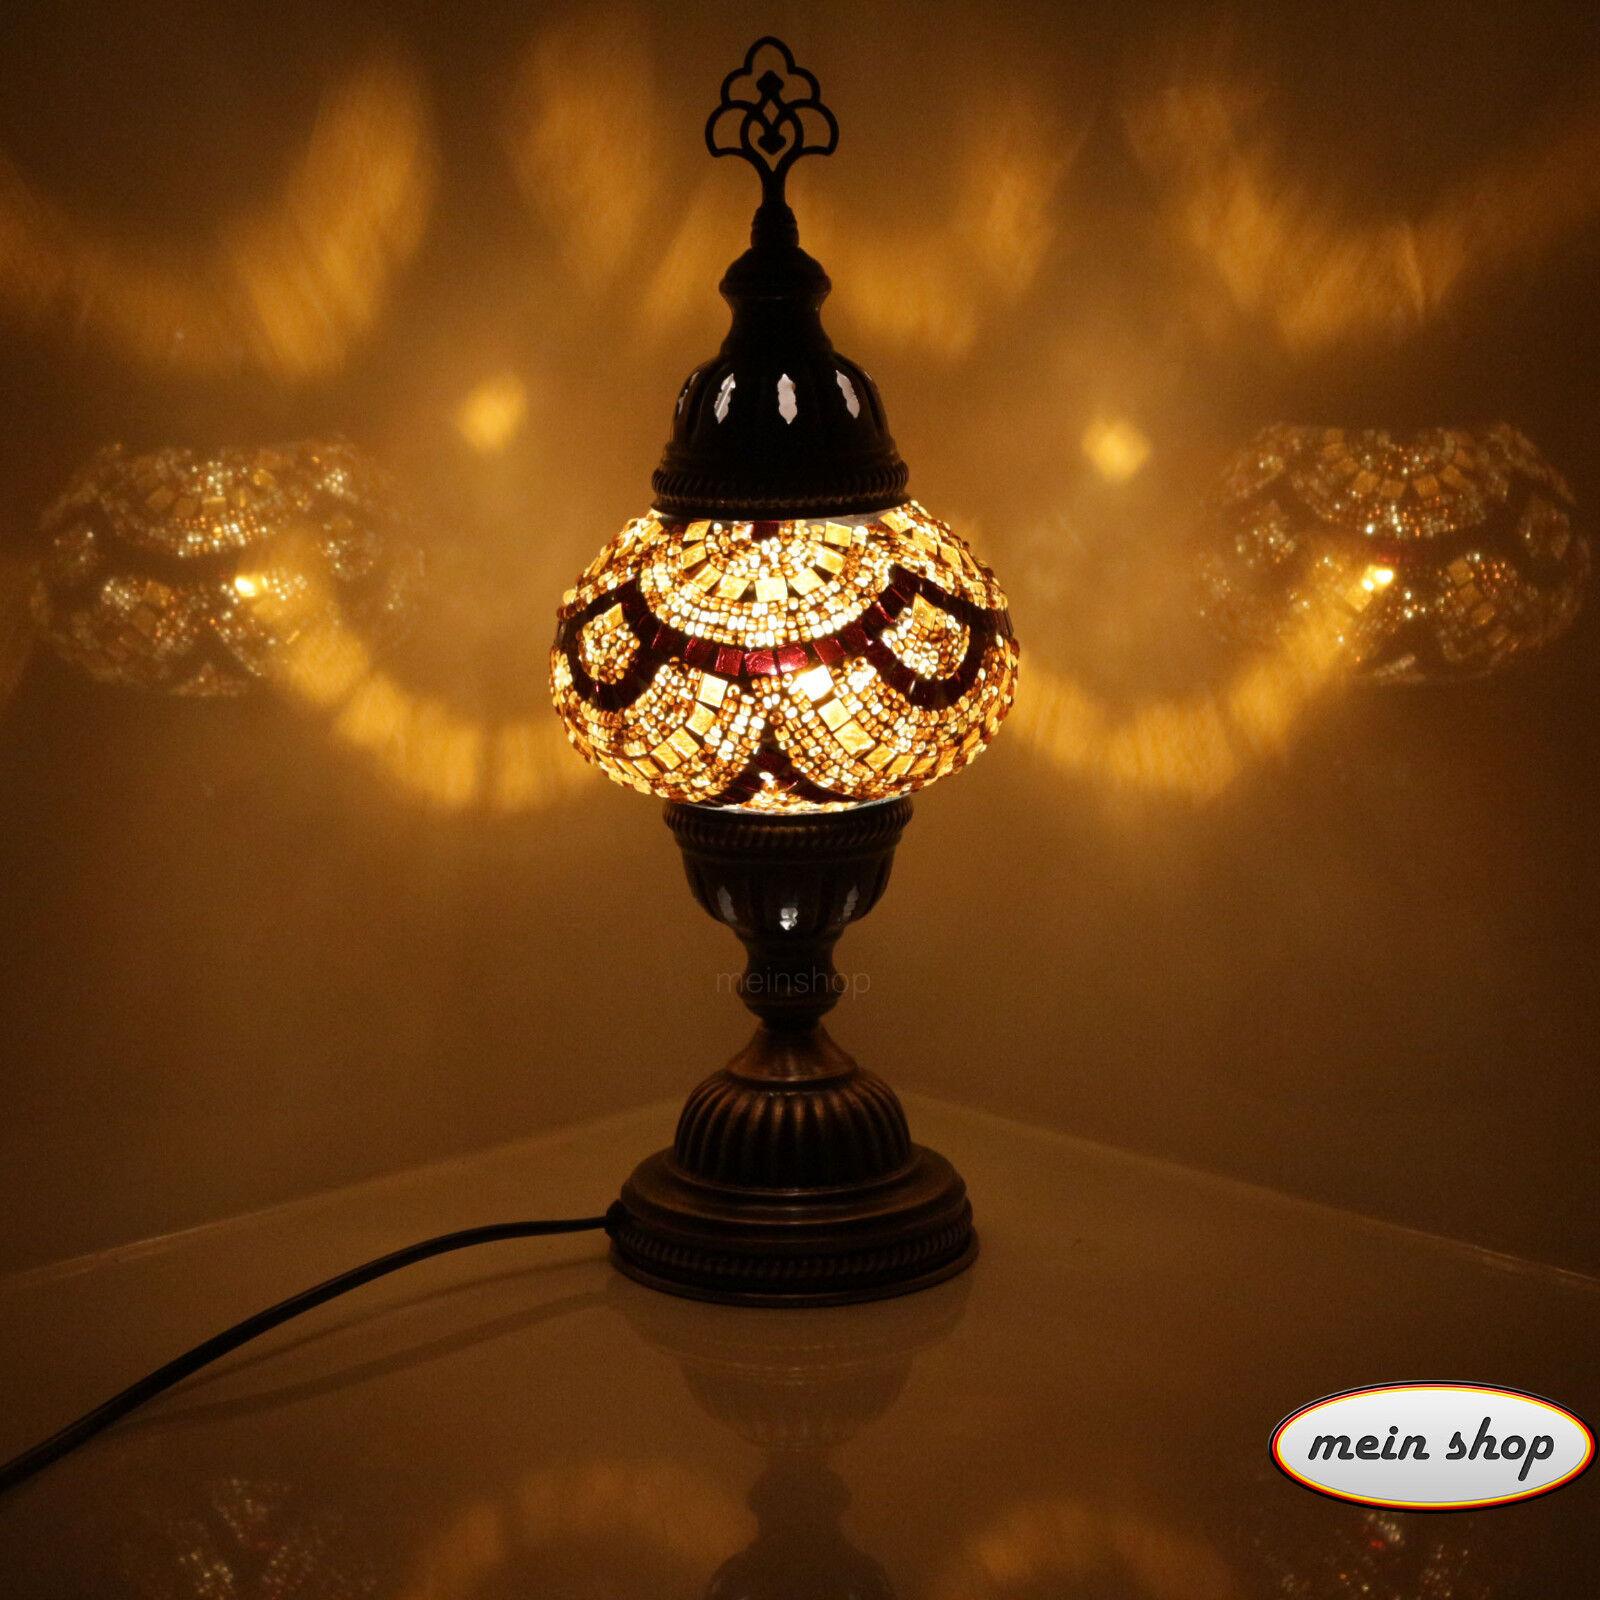 Mesa lámpara mosaico lámpara Mesa turquía mosaiklampe 100% mano trabajado orientales lámpara M 3e77e0